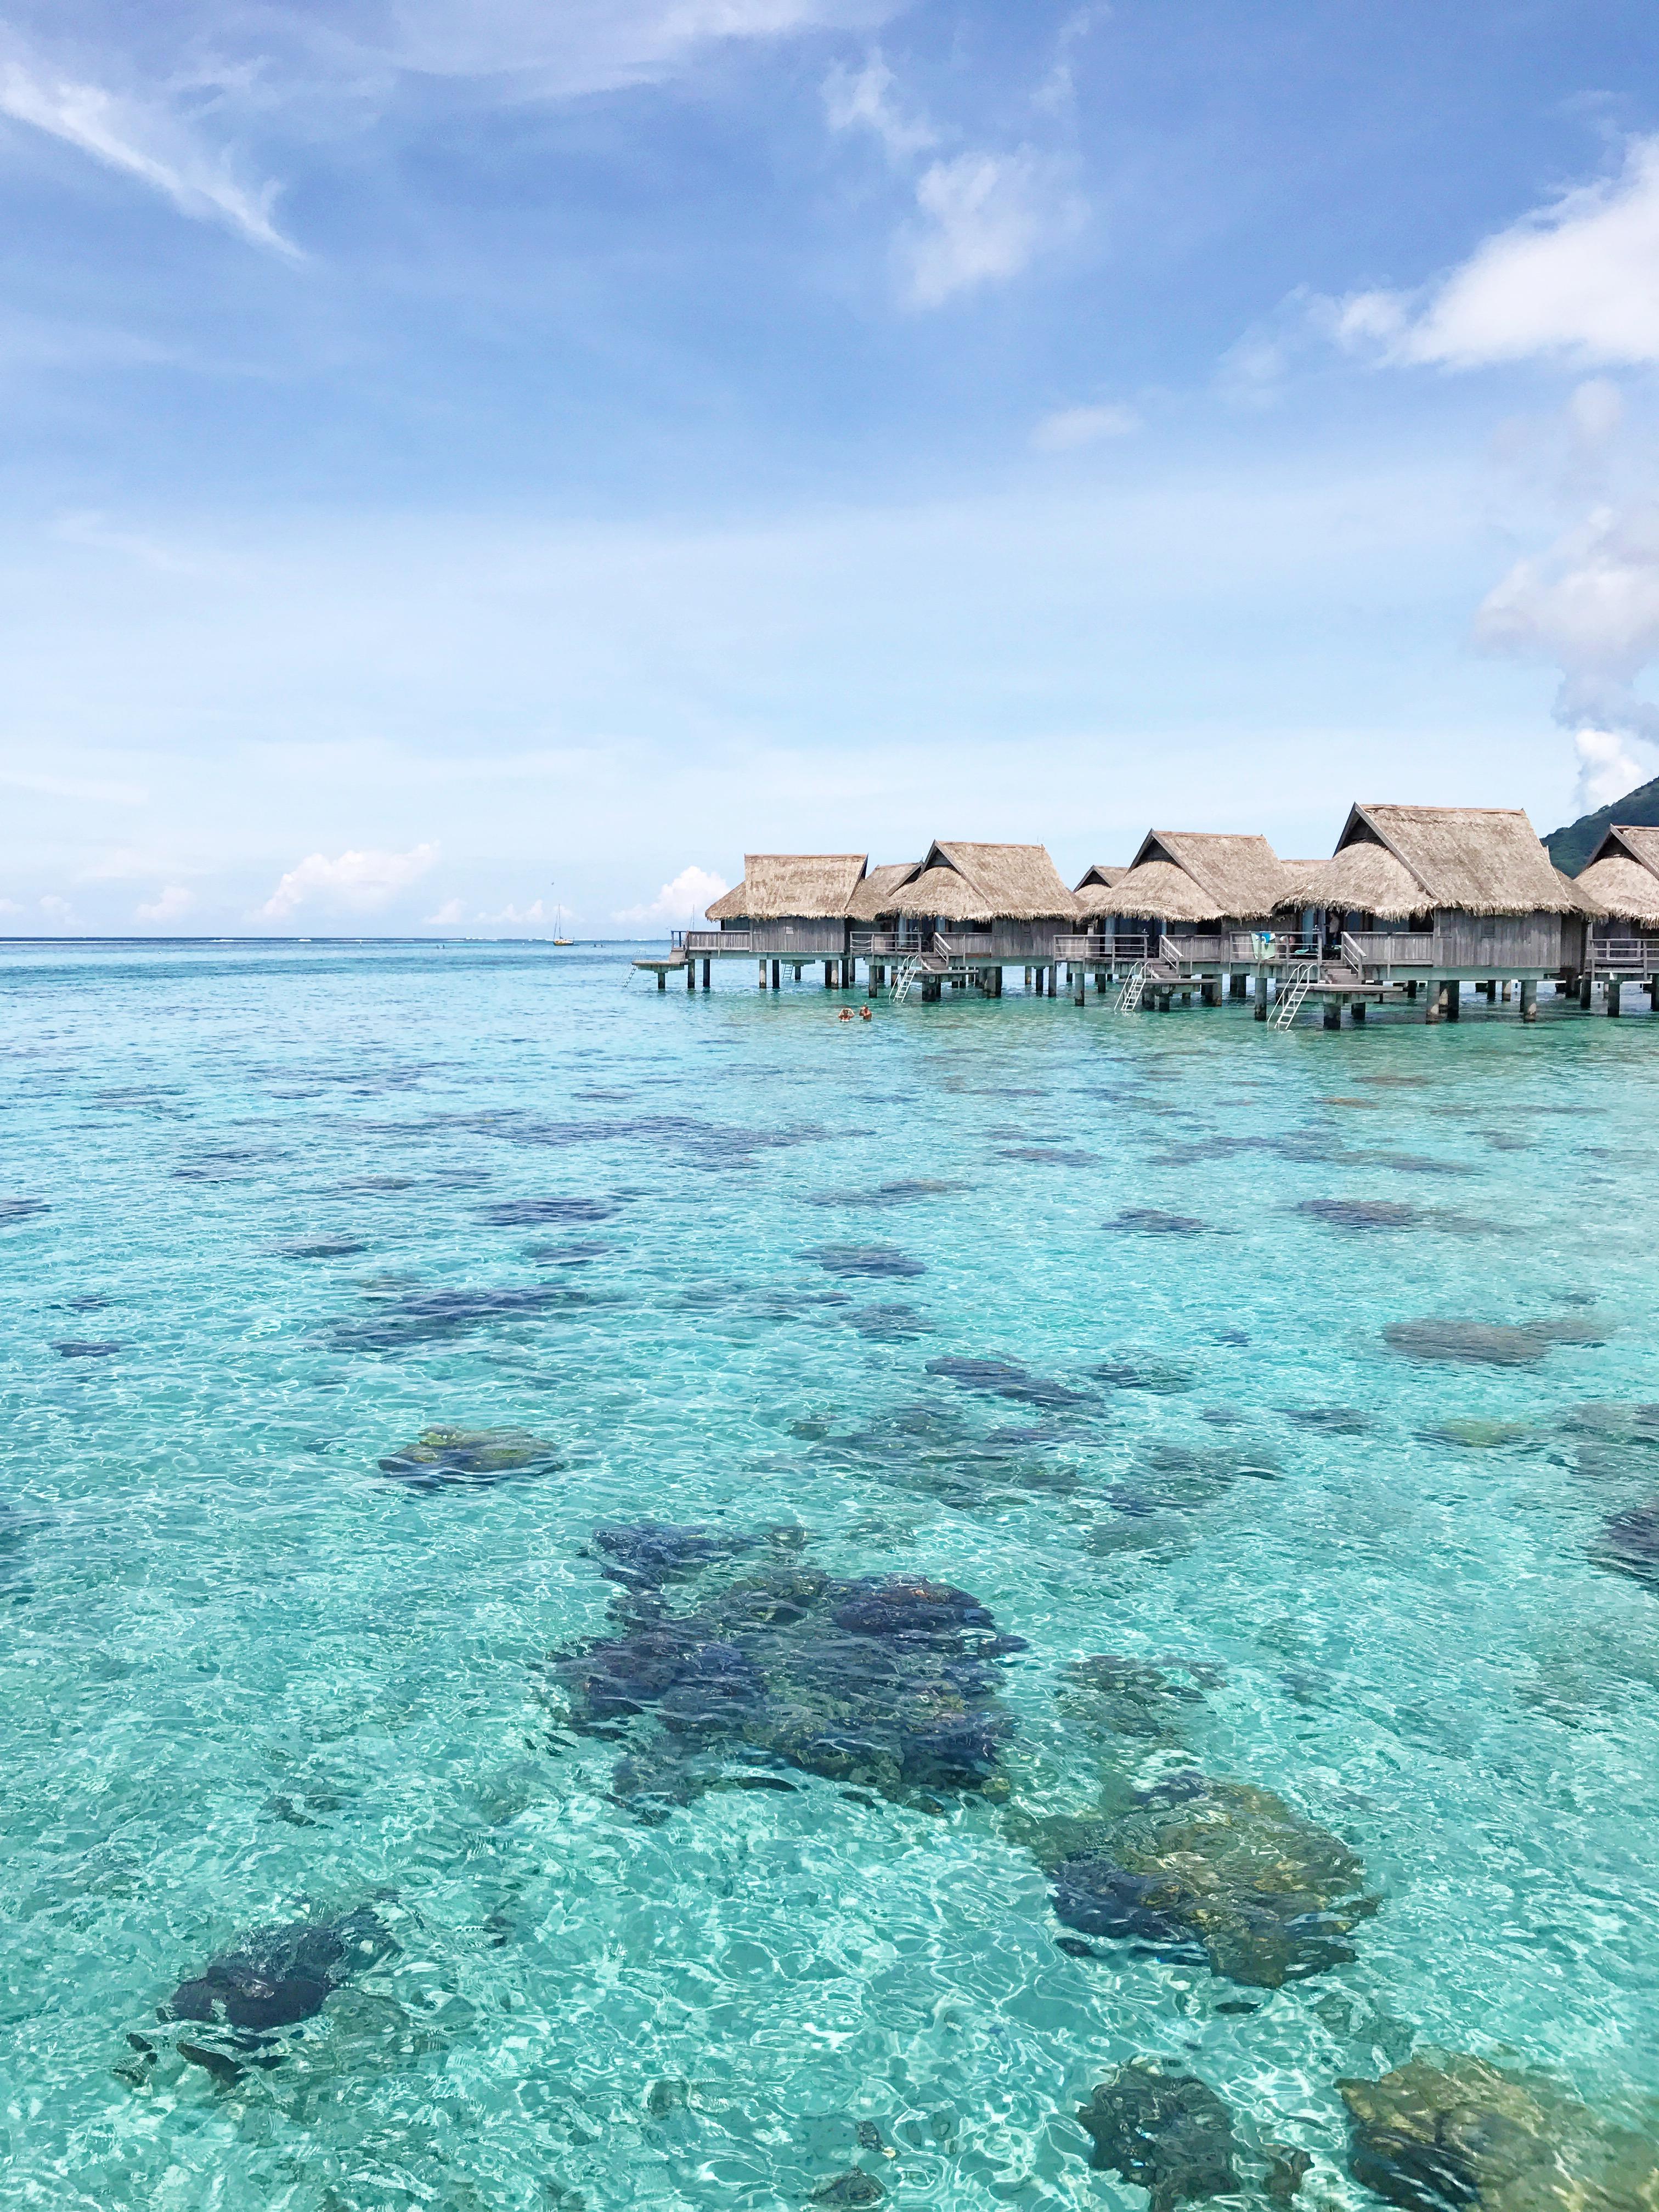 Our 2018 Tahiti Trip - Tahaa - Tahiti - Moorea - French Polynesia - Tropical Vacation - Tahiti Itinerary - Overwater Bungalow - Tahiti Trip Planning - Communikait by Kait Hanson